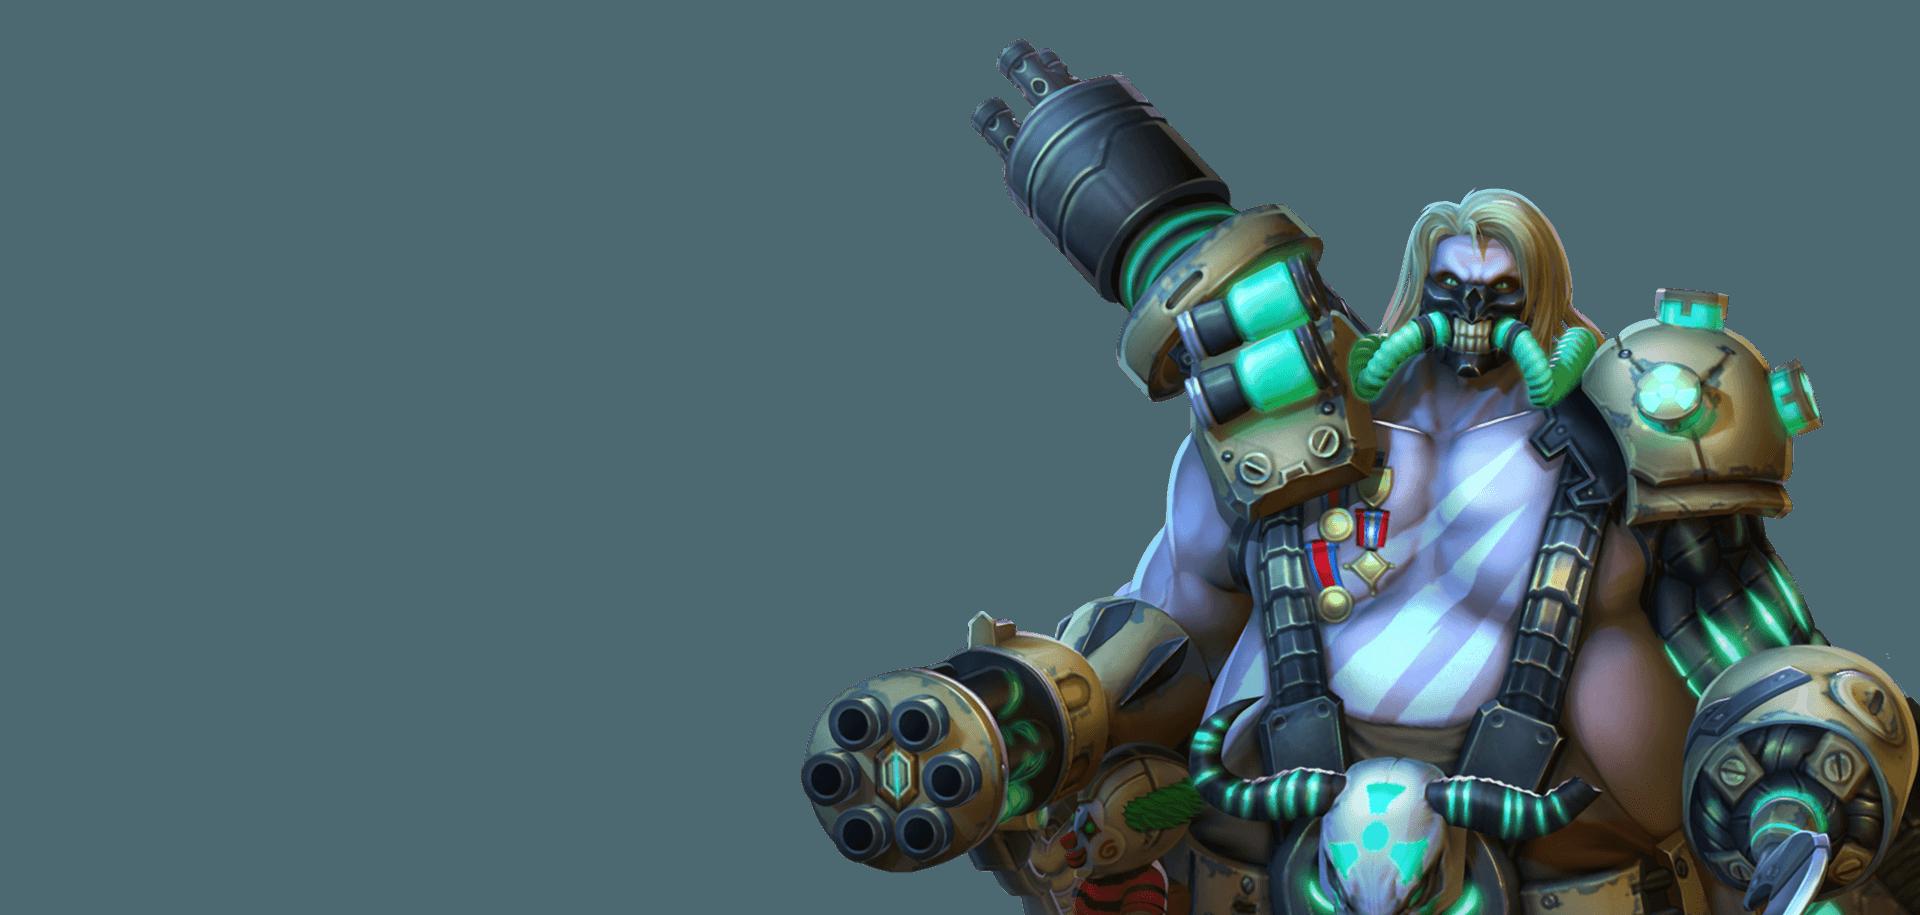 Overwatch Hero Mission Roadhog